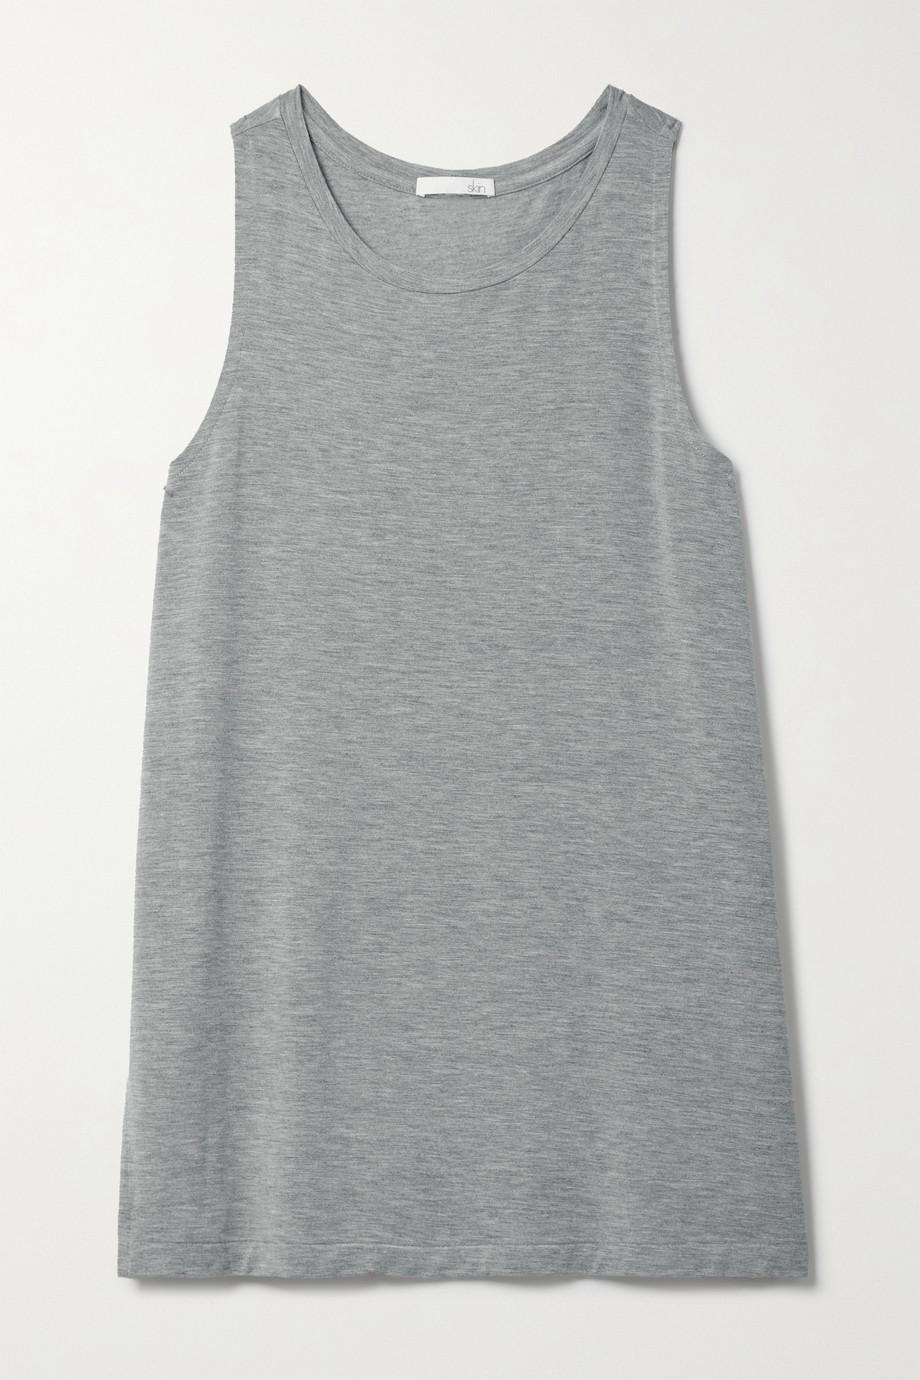 Skin Débardeur en jersey stretch chiné Linor